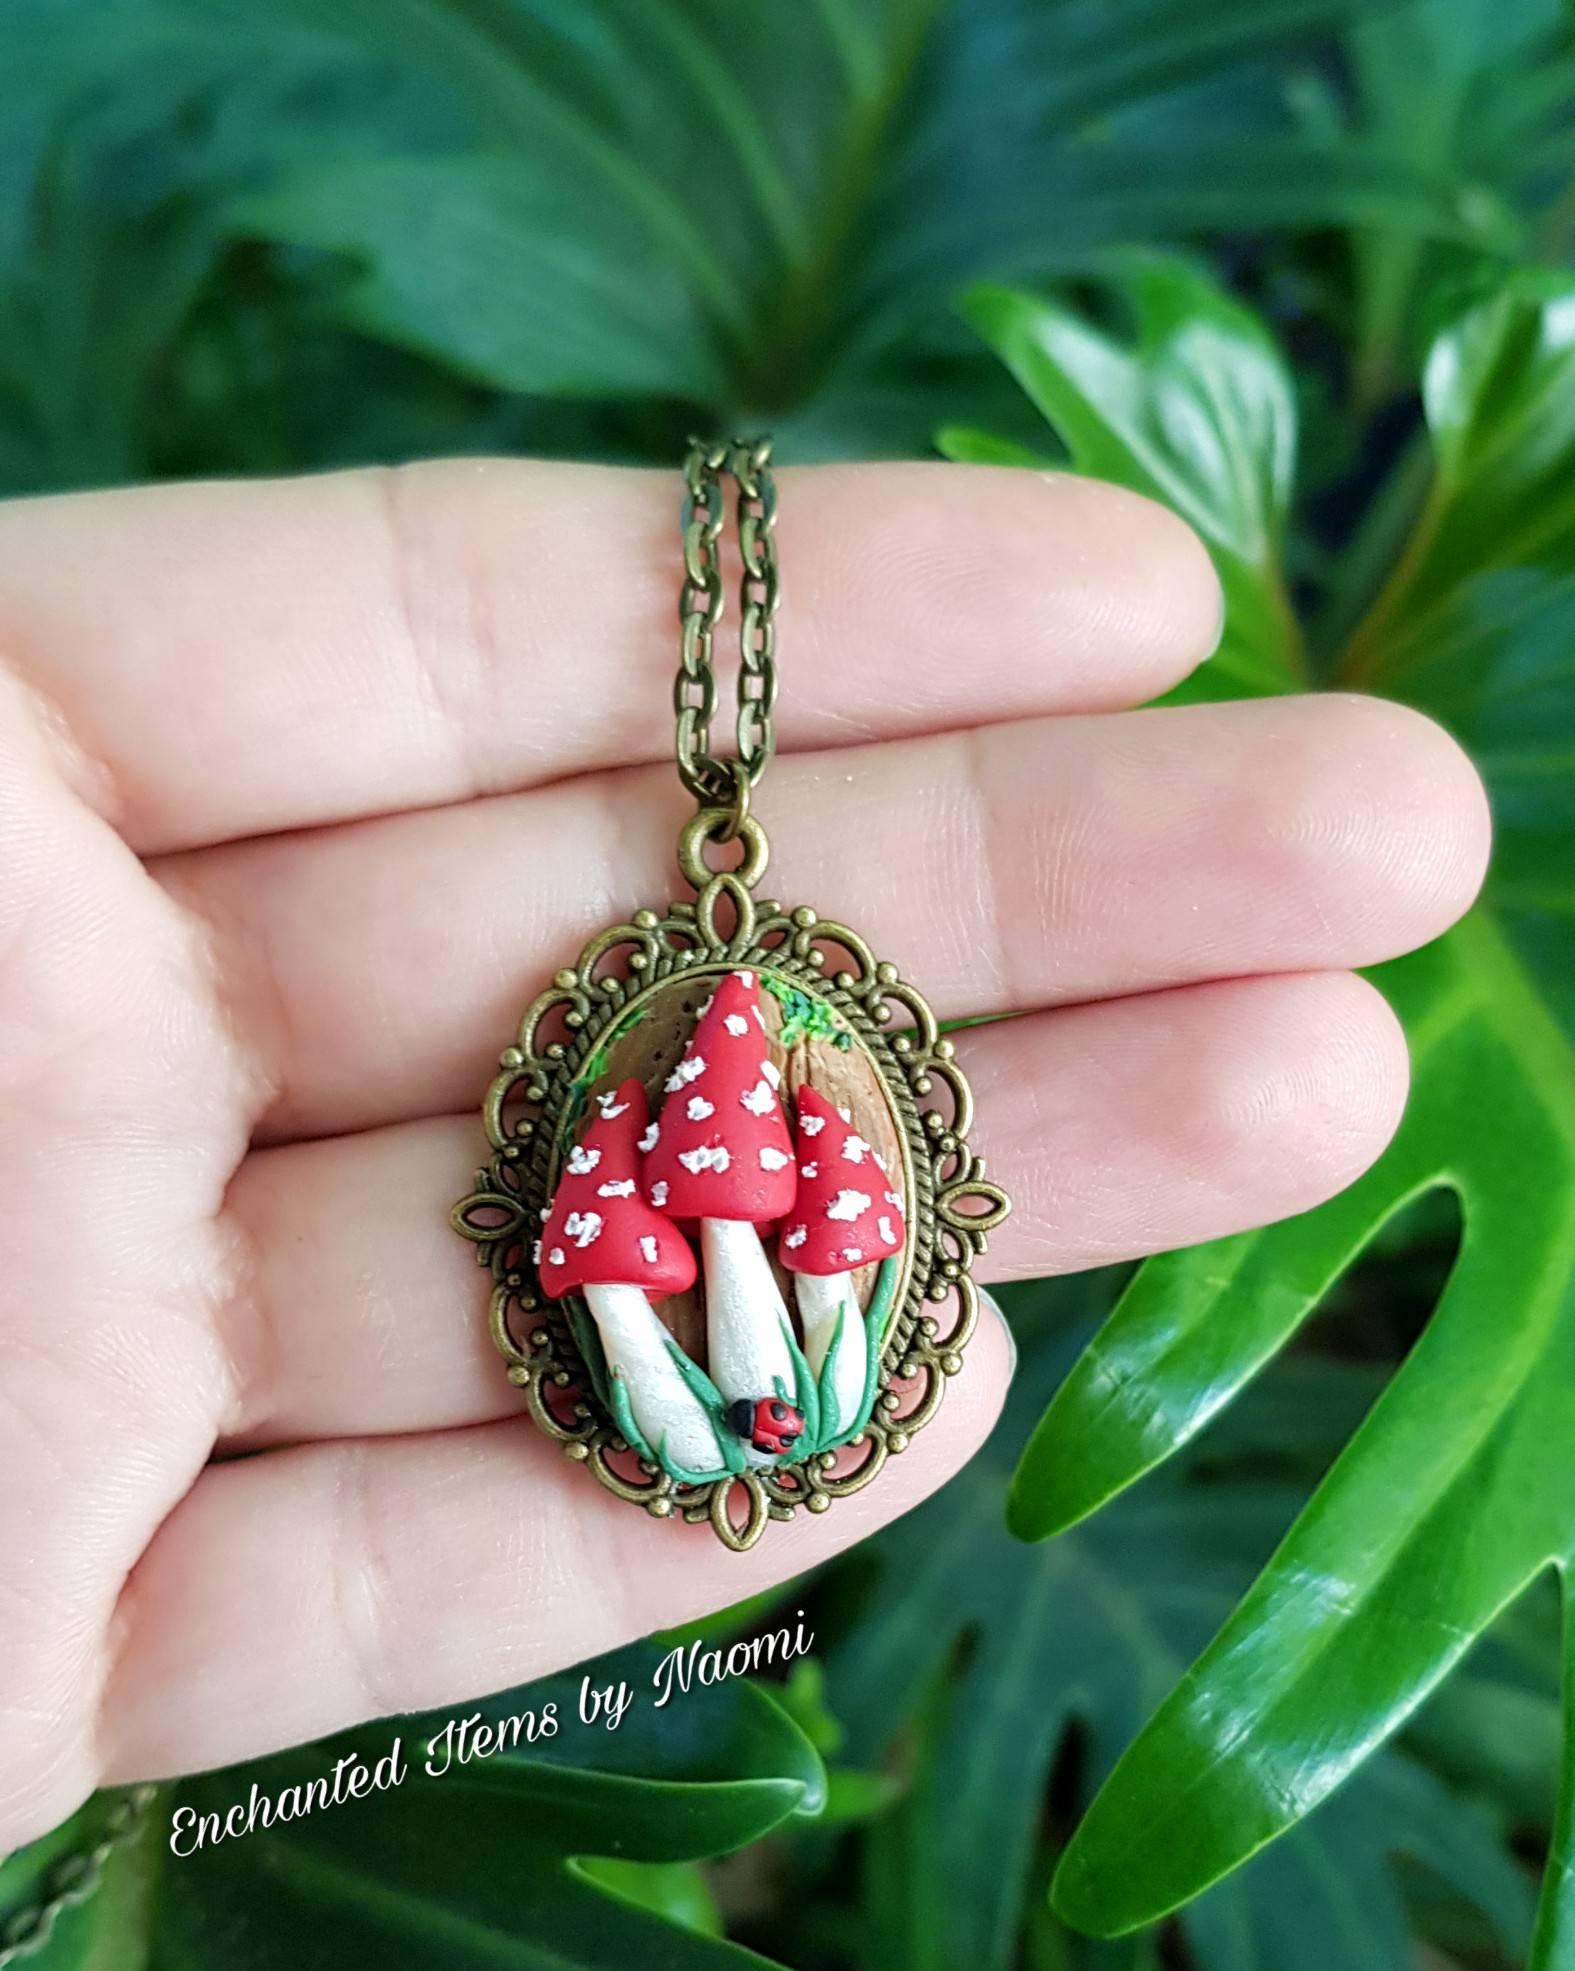 Enchanted Items by Naomi - Love Australian Handmade